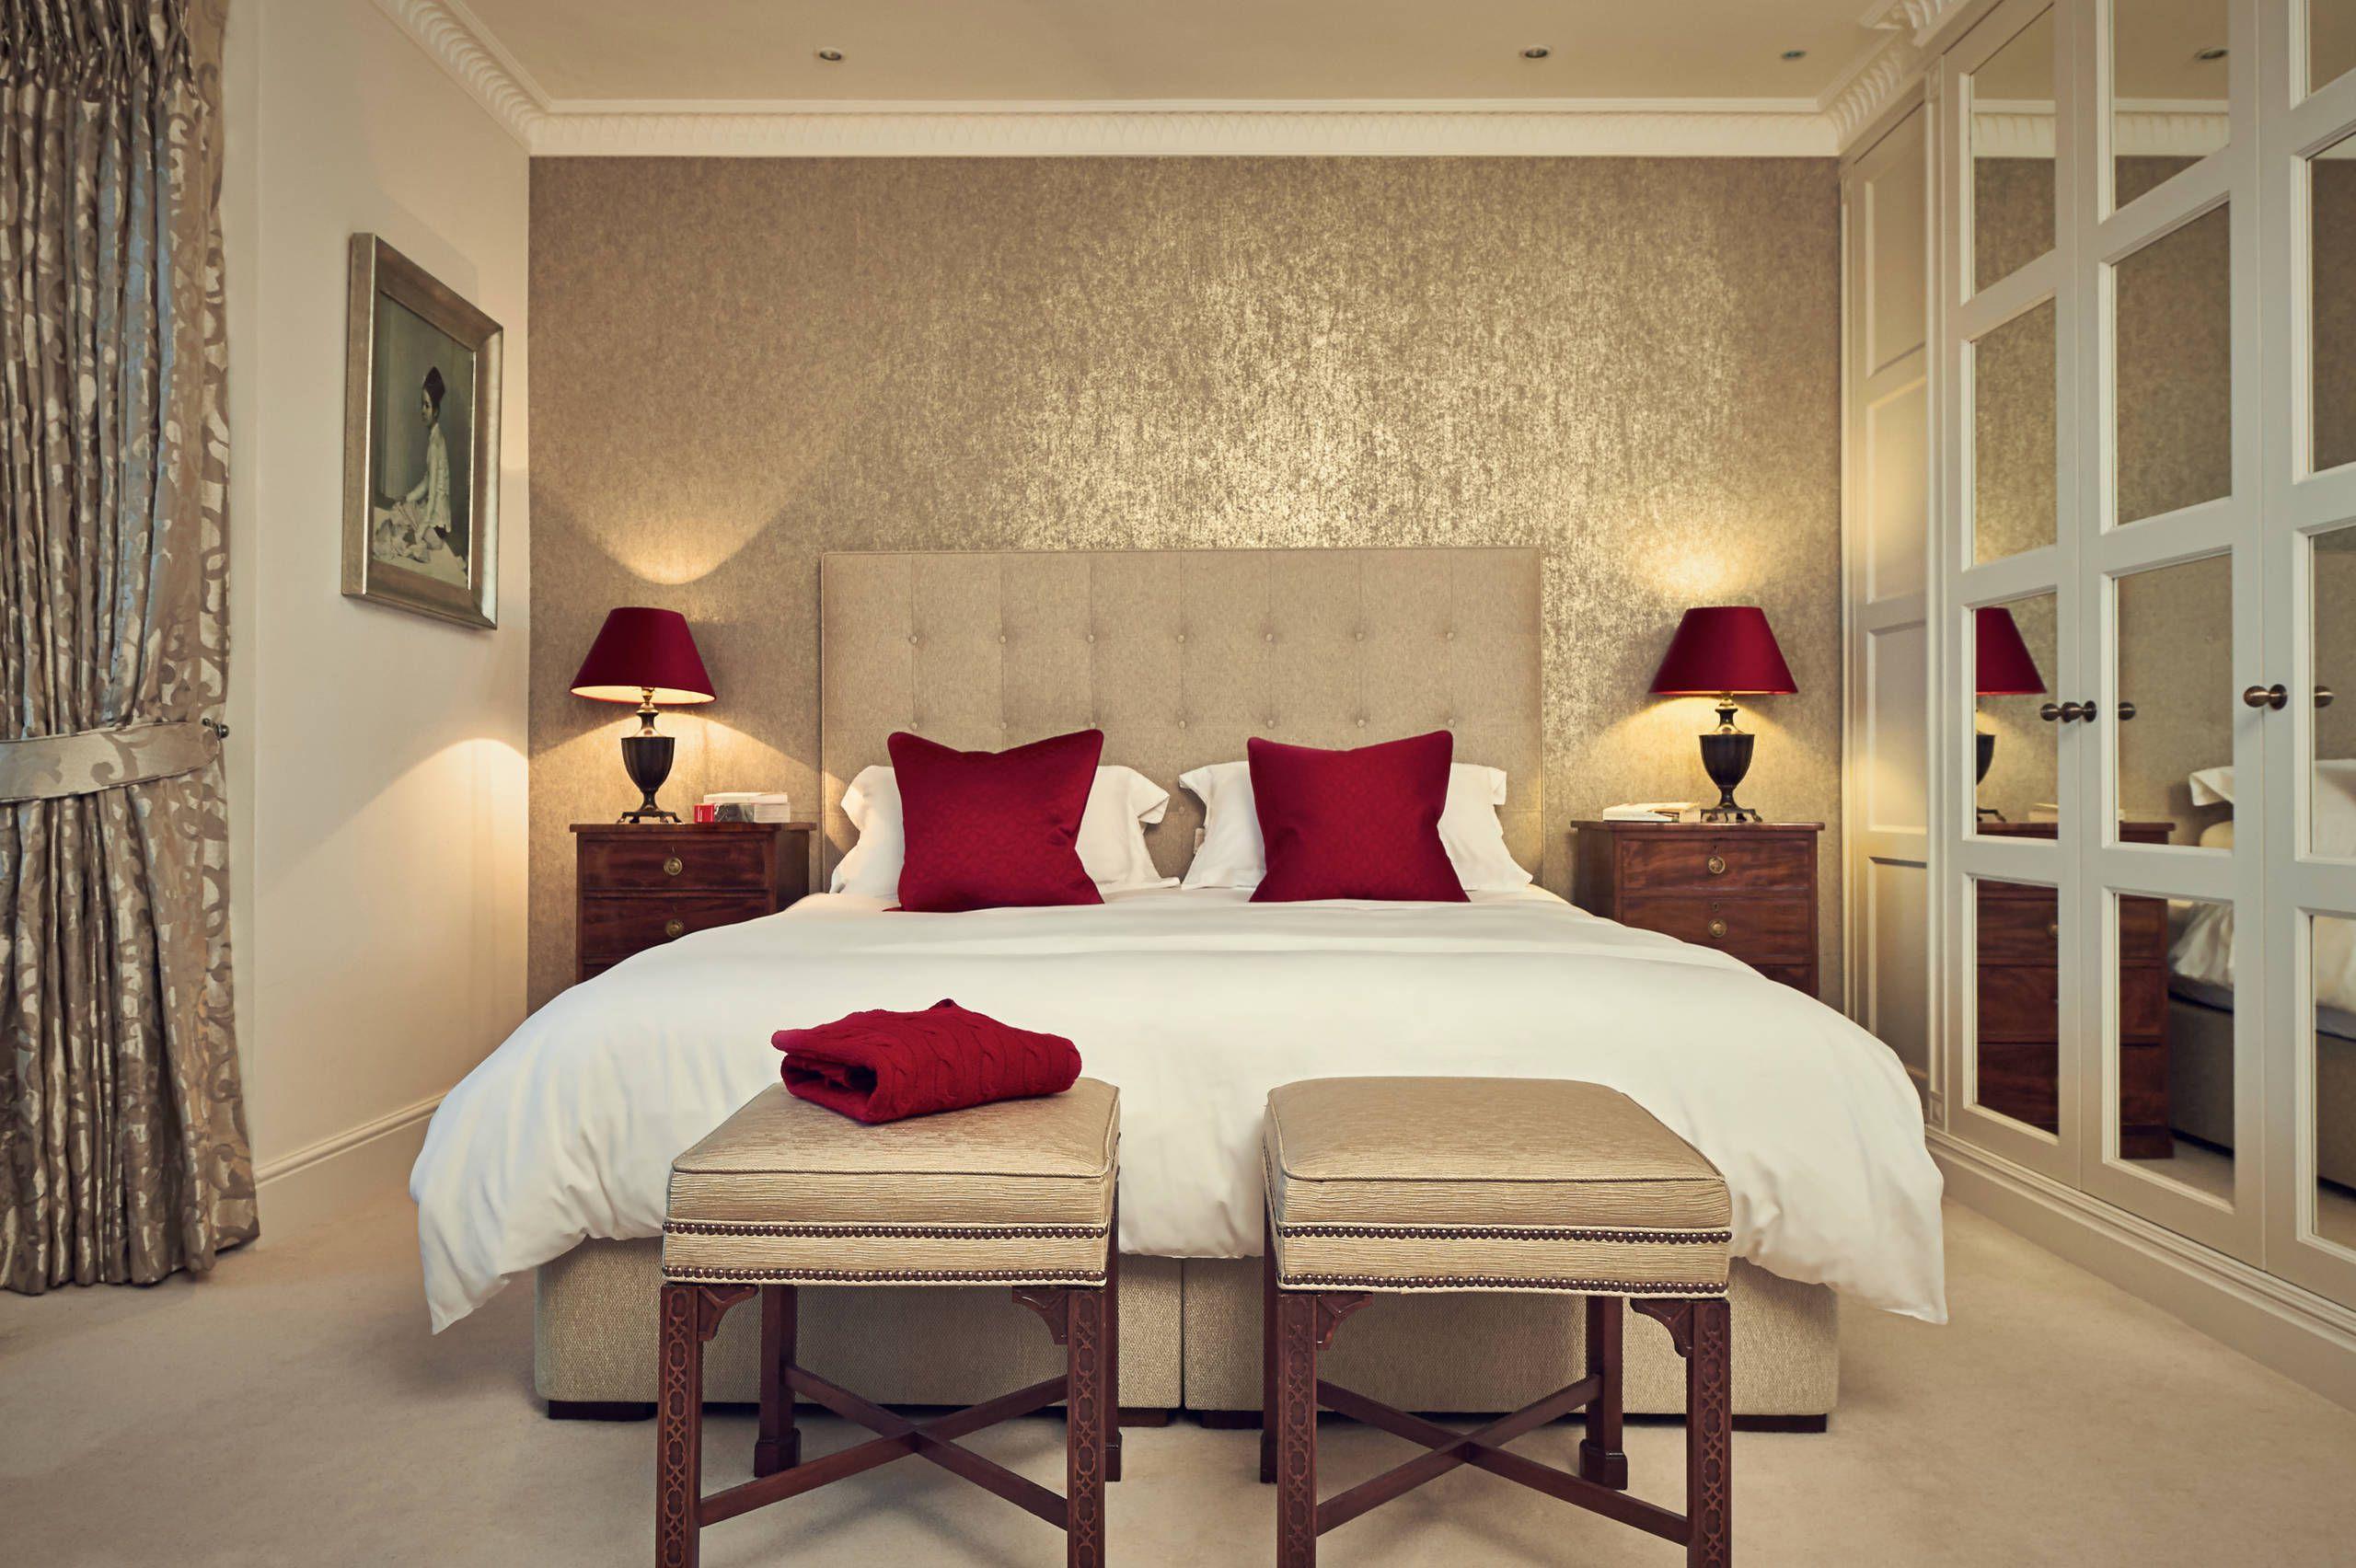 Traditional romantic master bedroom decor  Elegant Bedroom Decorating Ideas Glamorous Elegant How To Decorate A